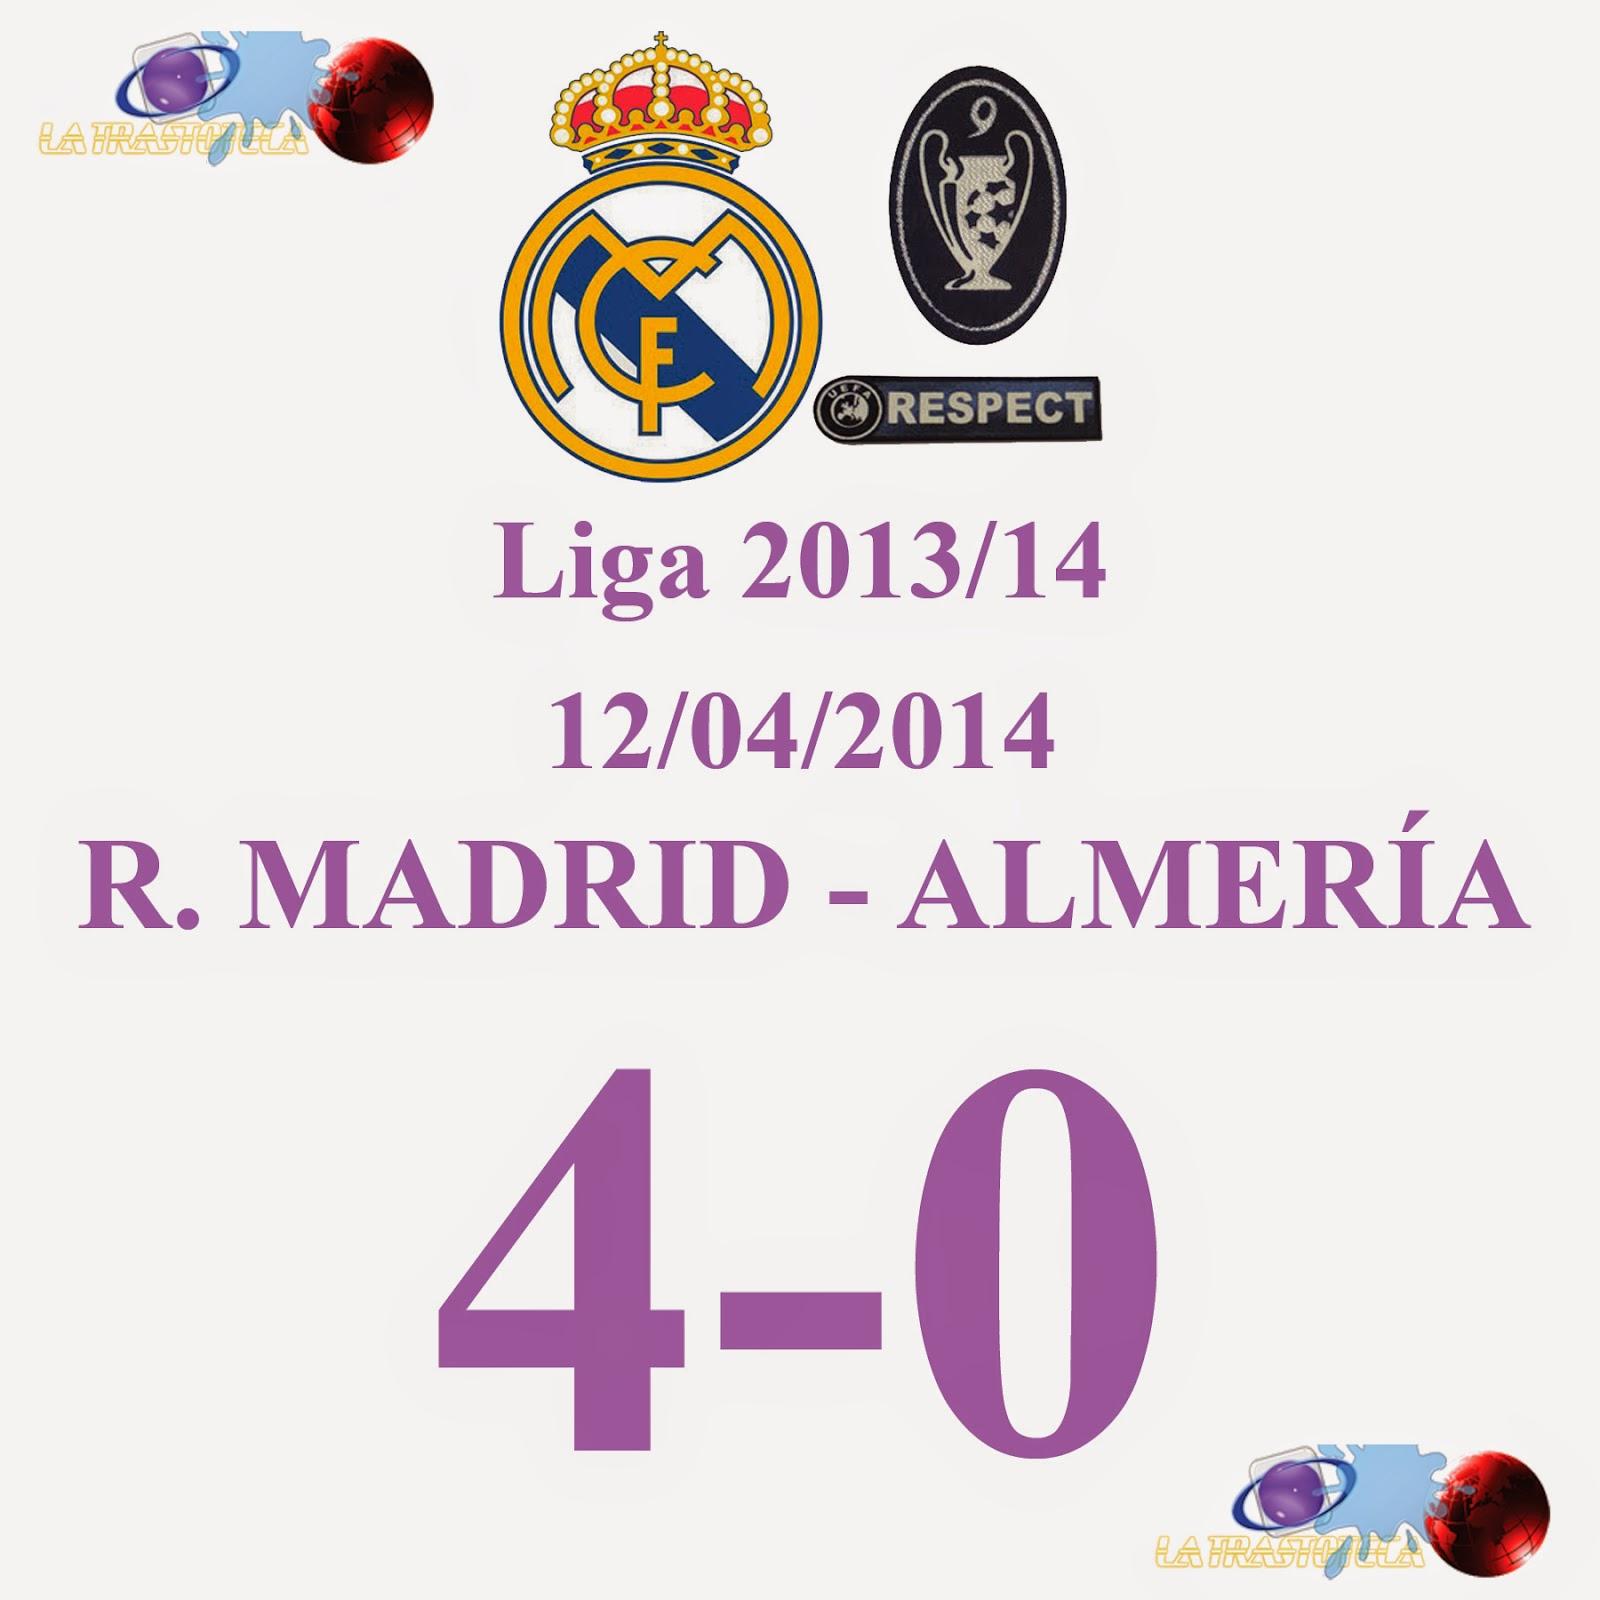 Isco (3-0) Jornada 33 - 12/04/2014